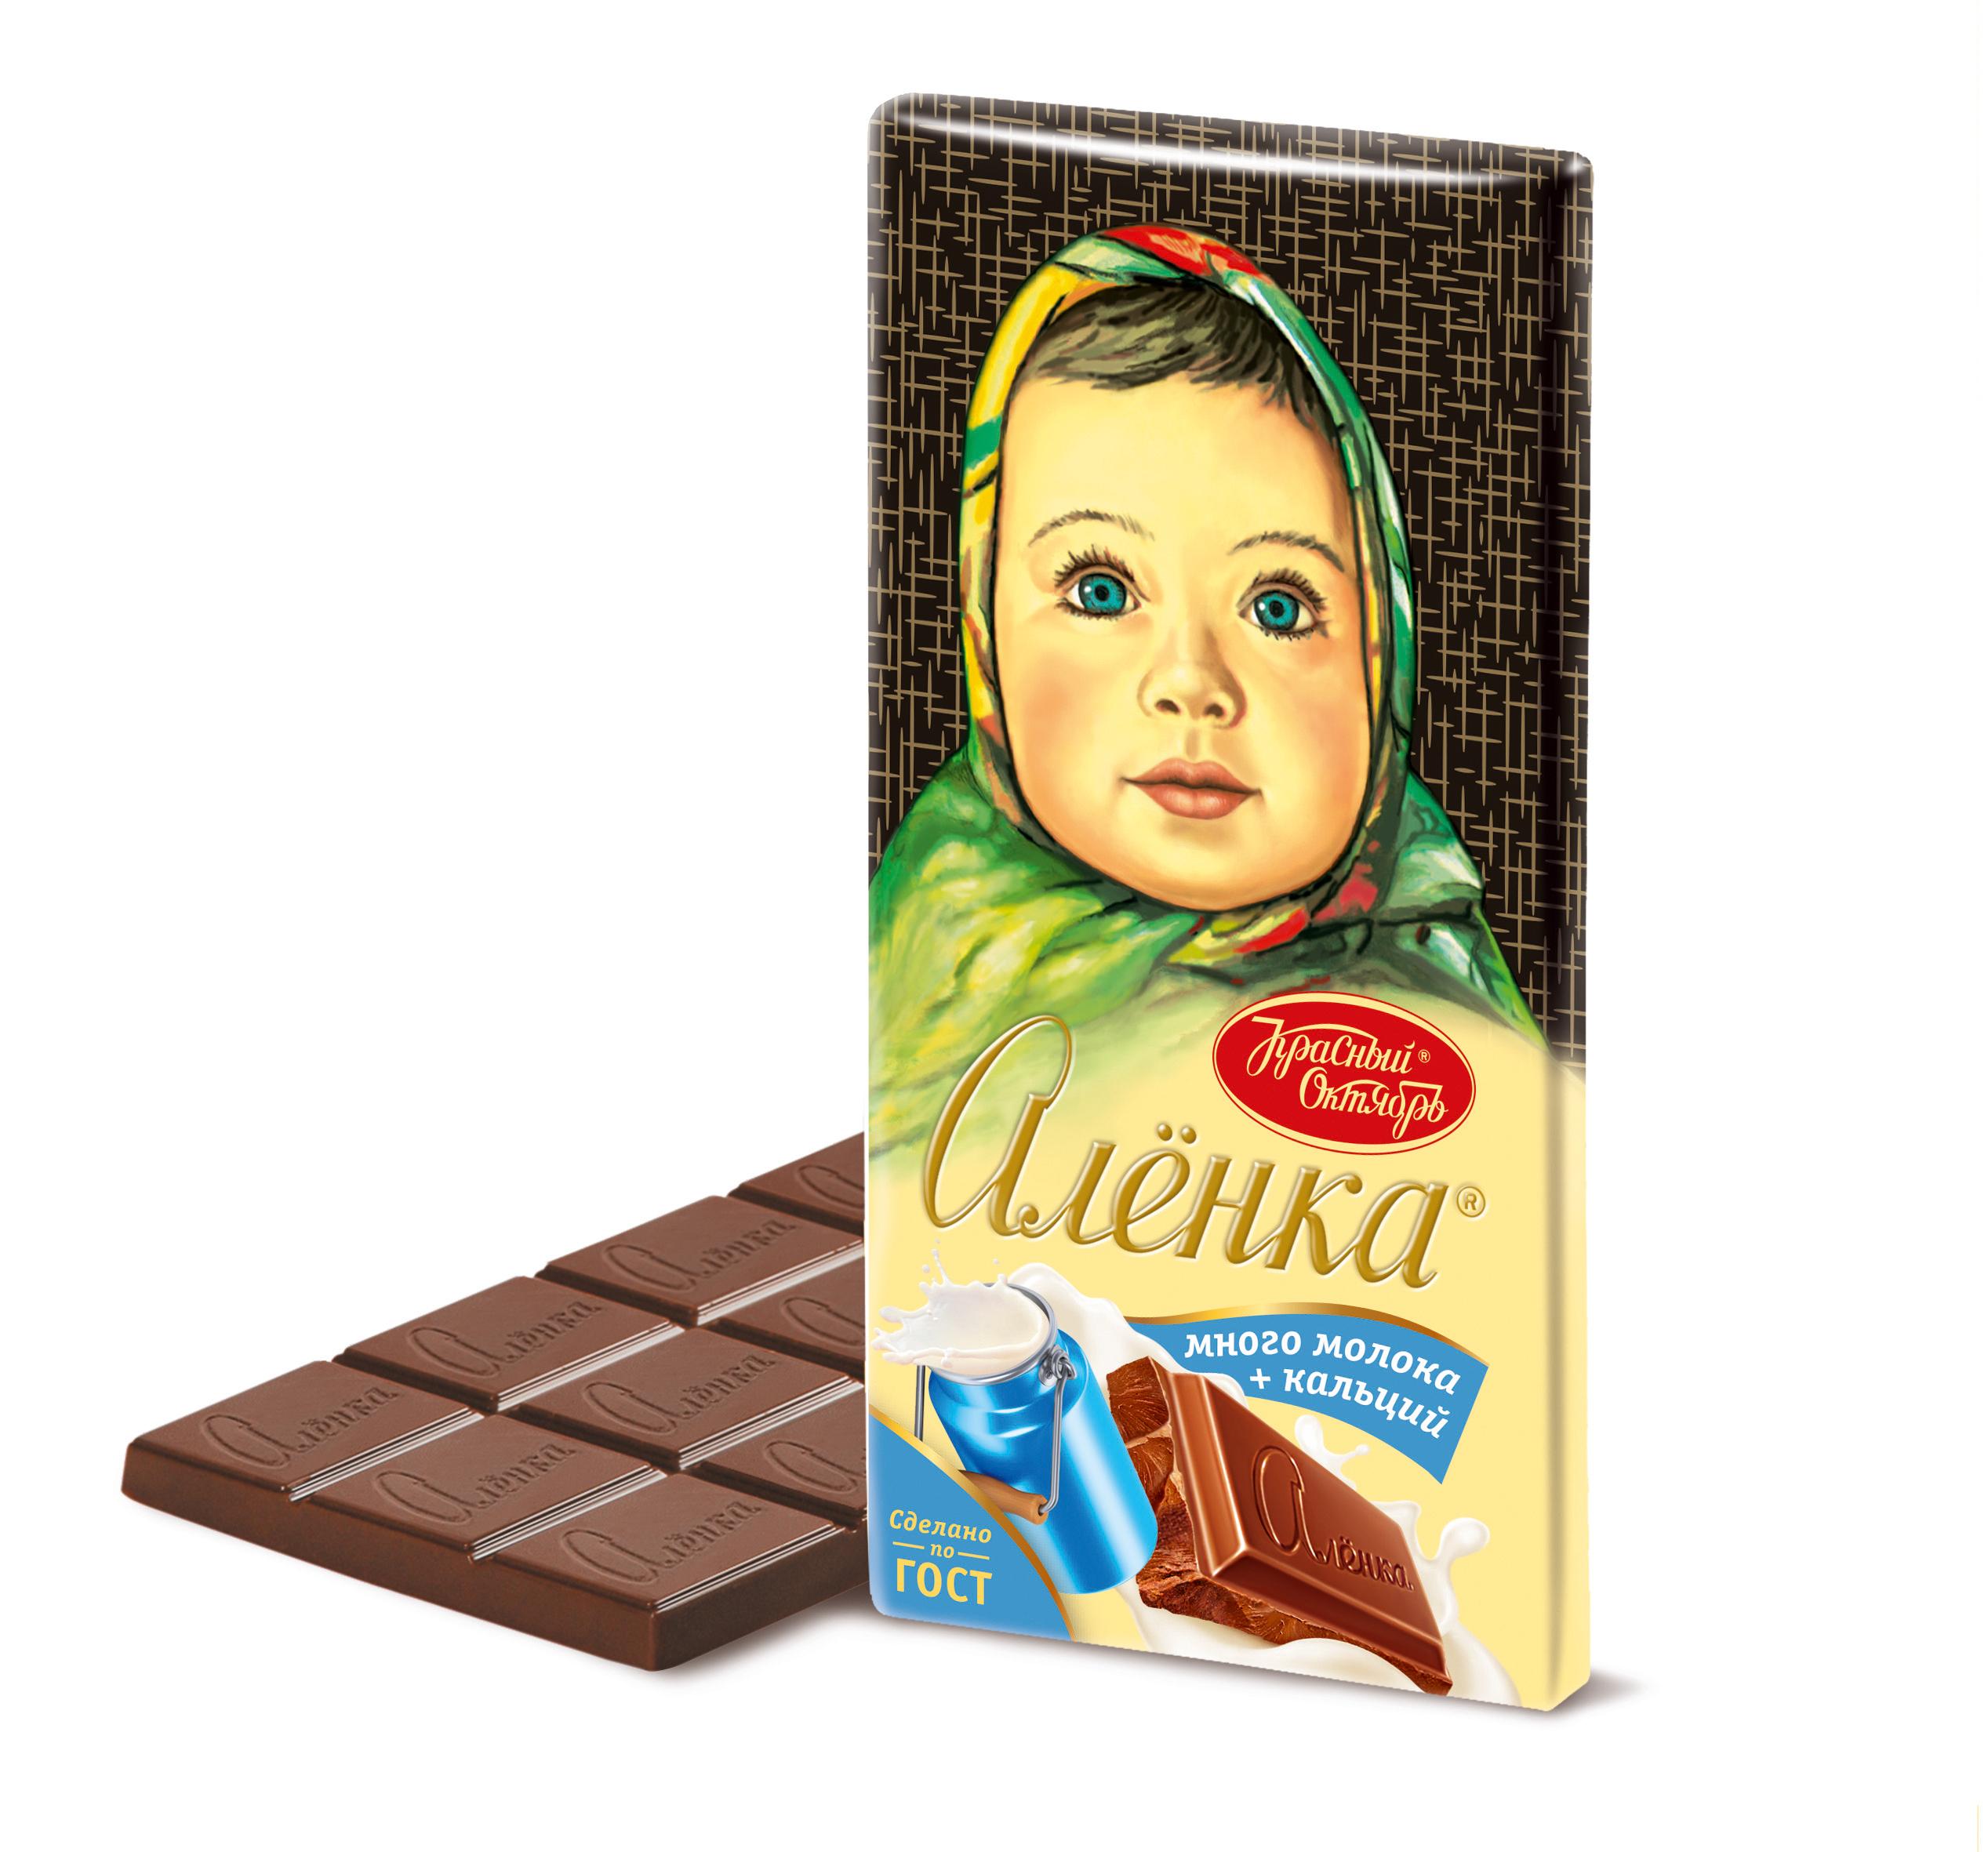 Шоколад Аленка много молока 90гр.